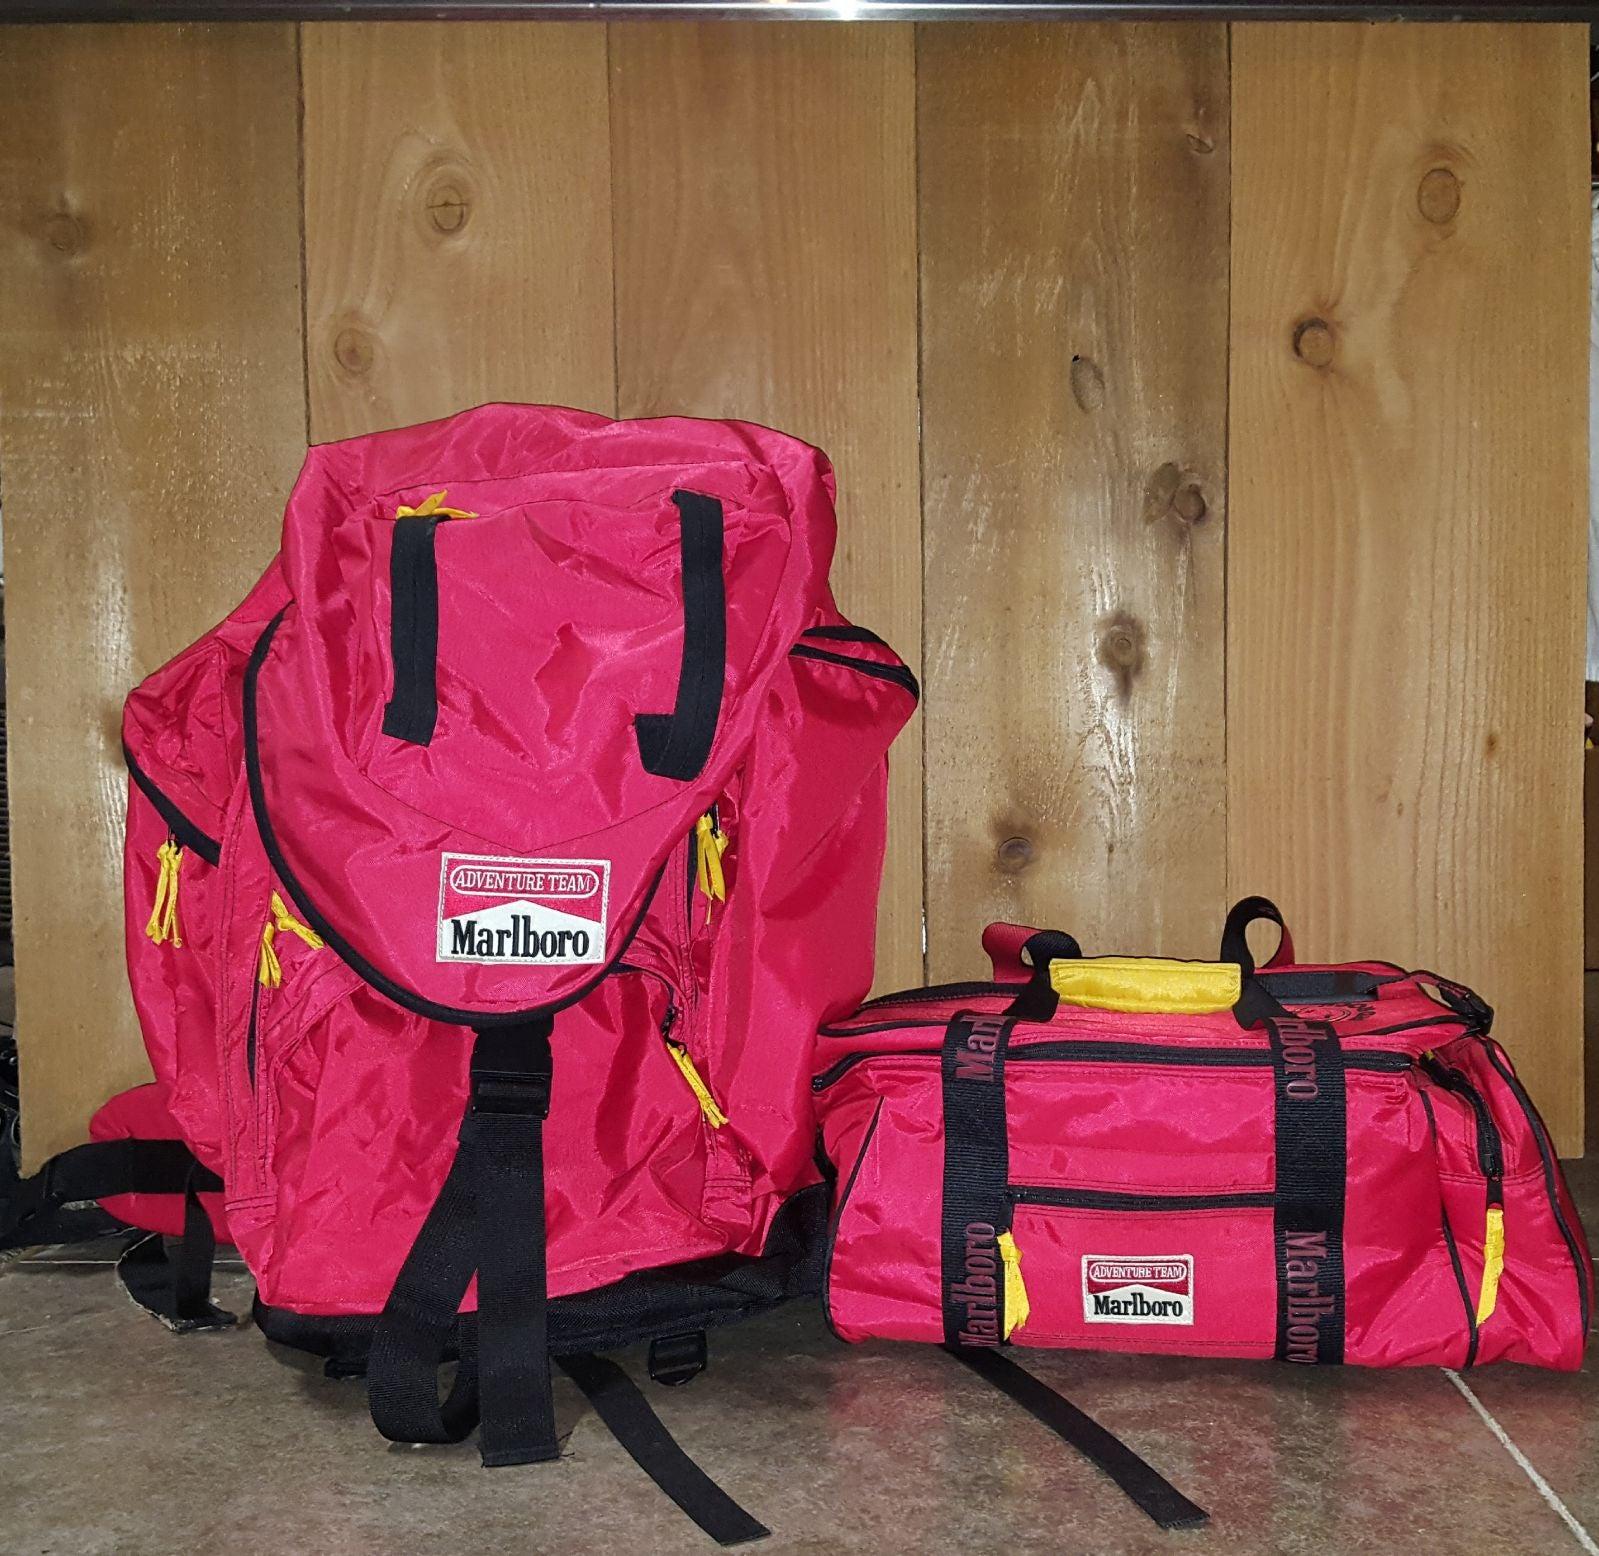 Marlboro backpack and cooler